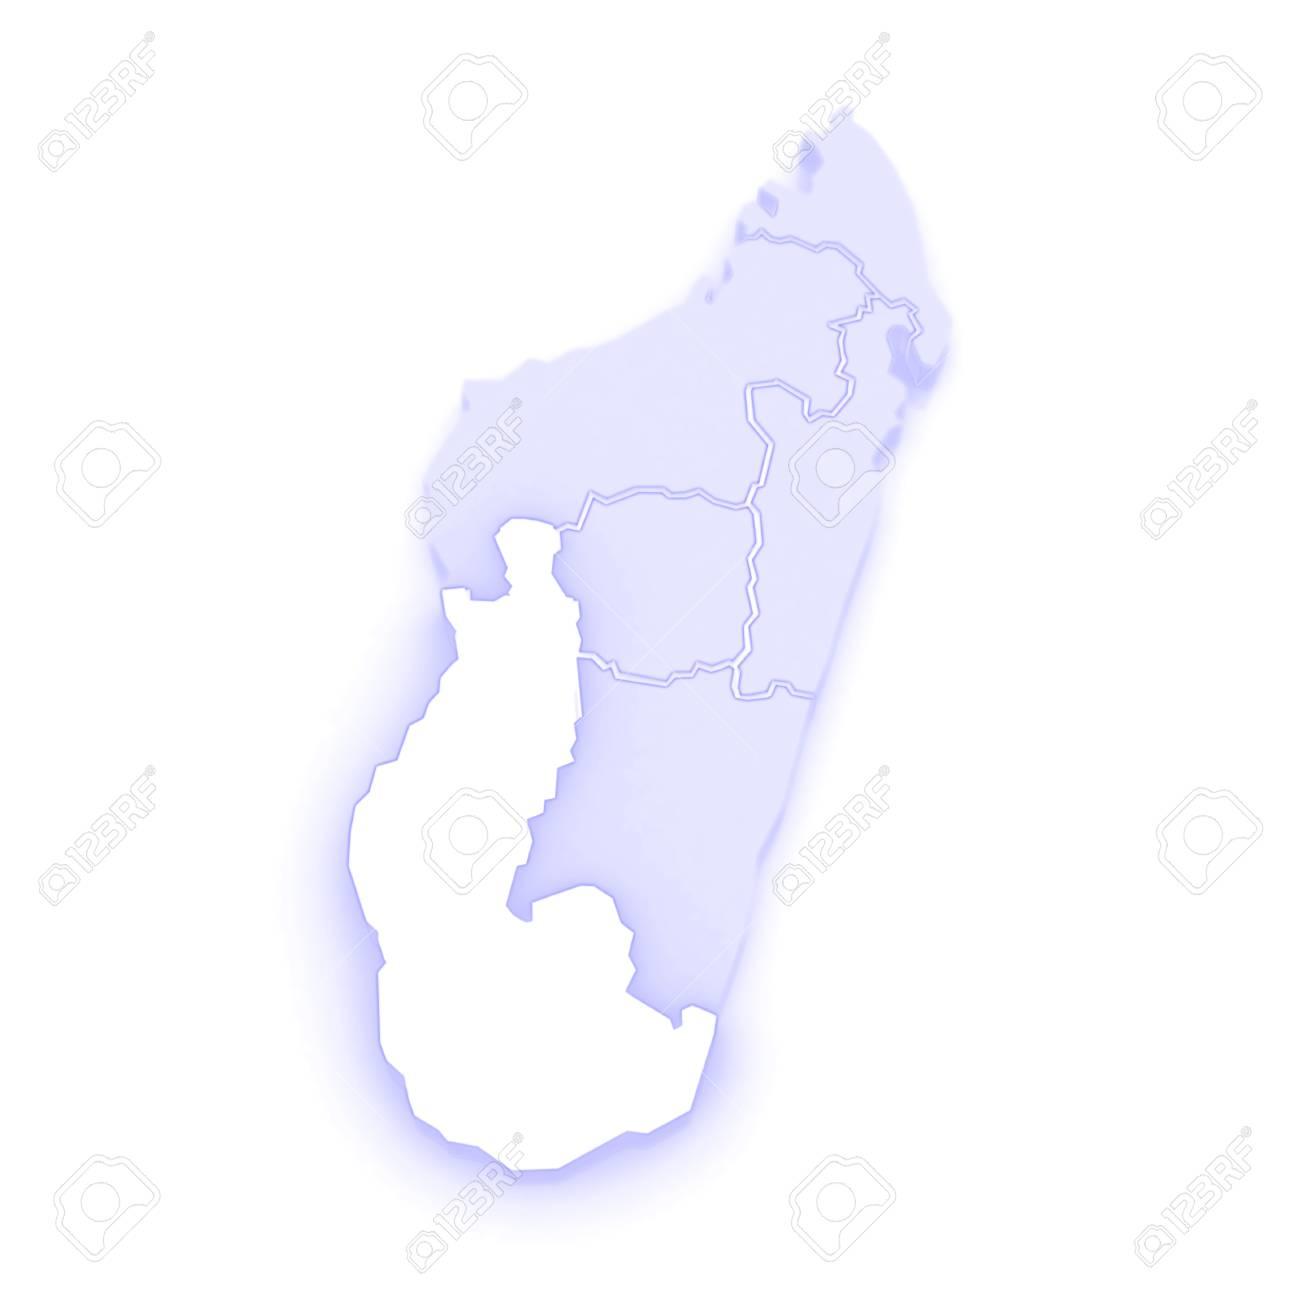 Map of Toliara. Madagascar. 3d